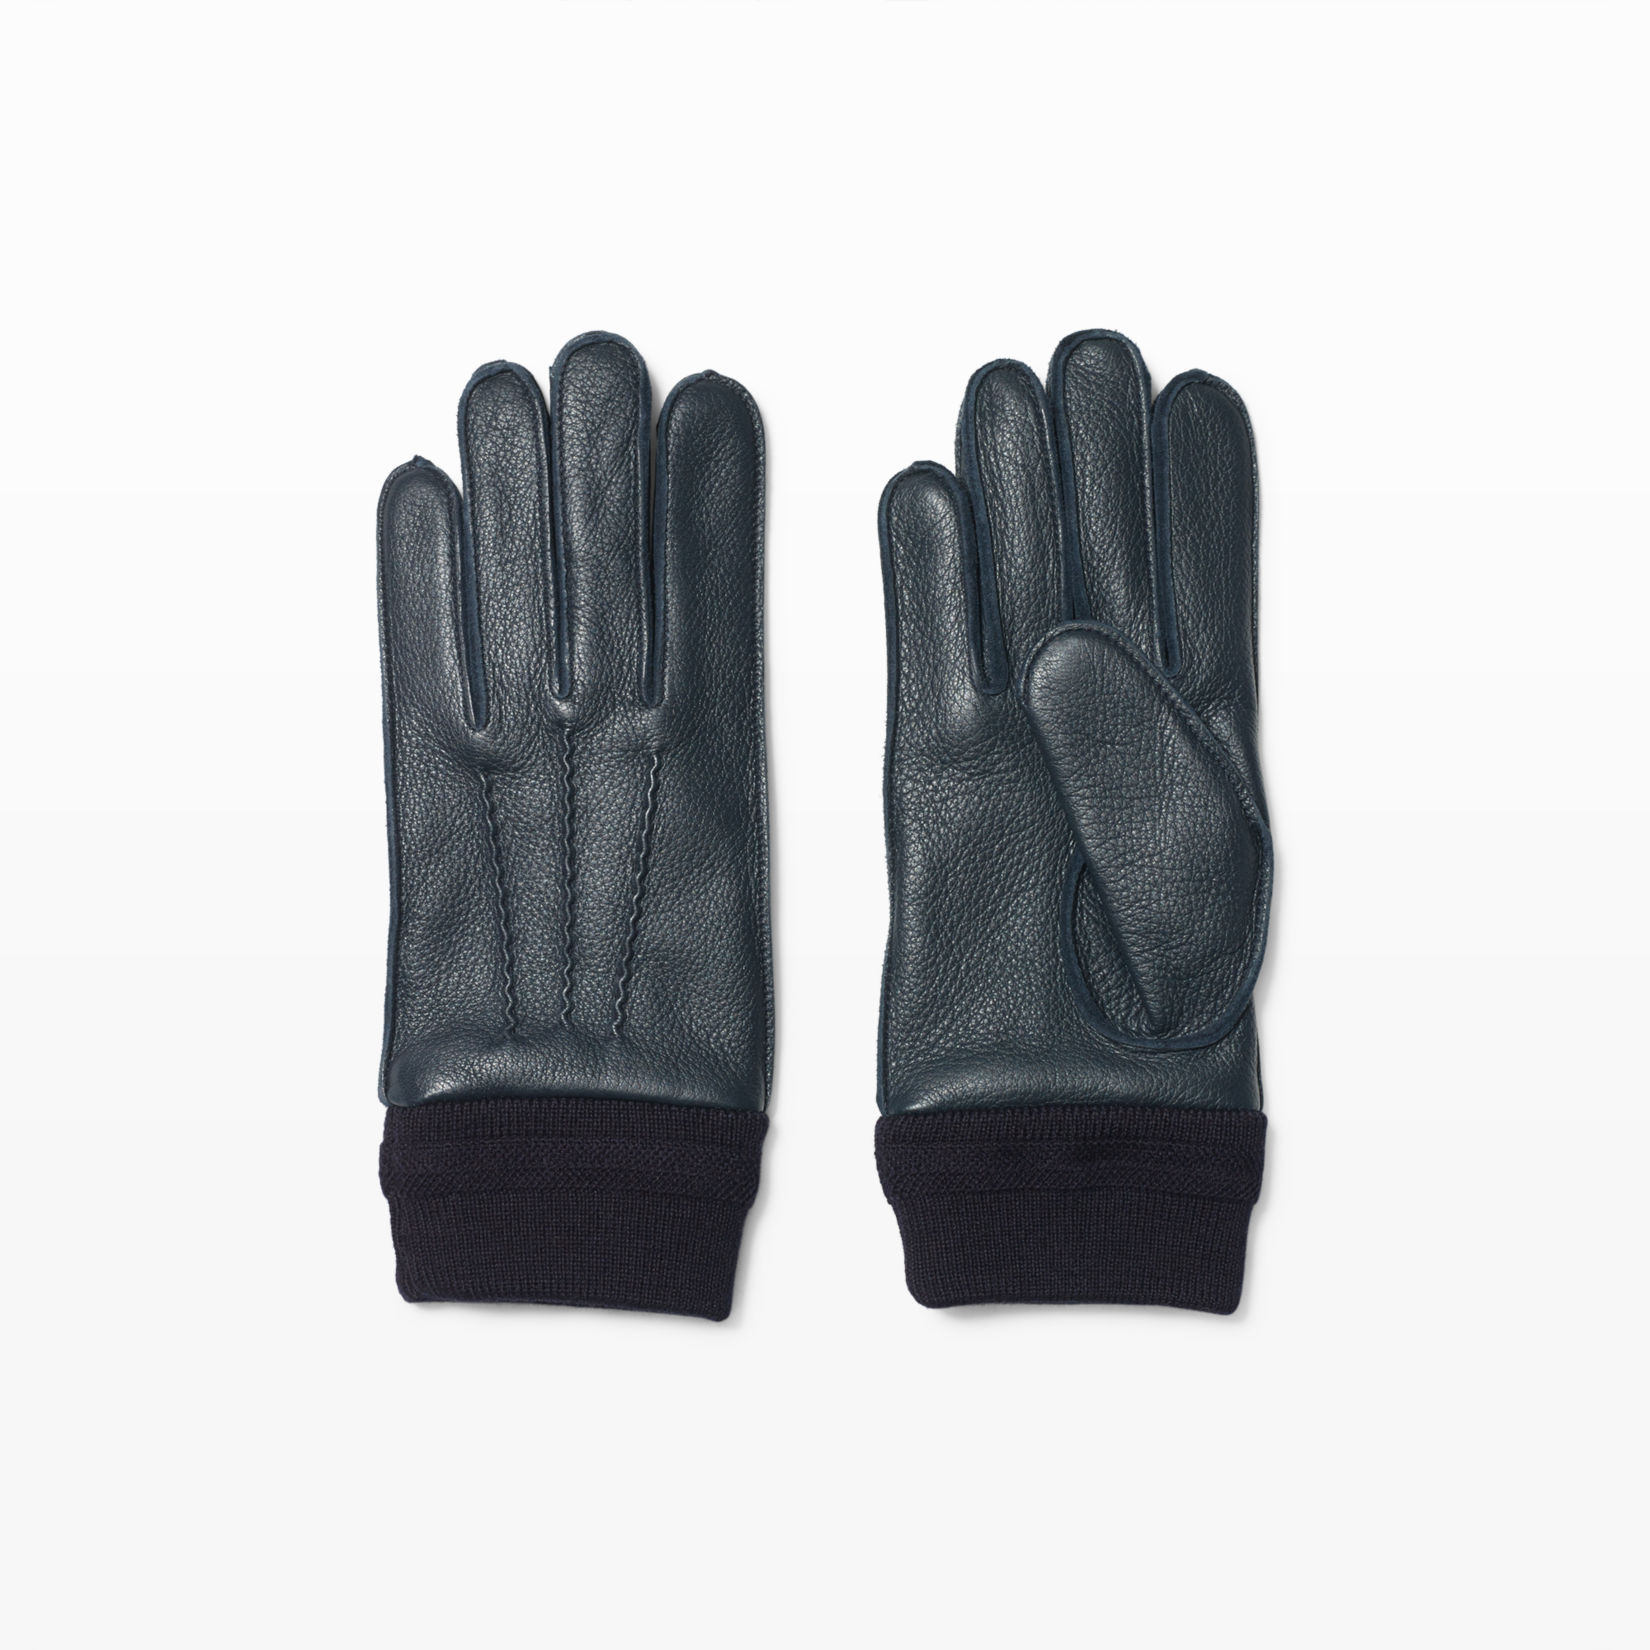 Womens leather gloves reviews - Men Racking Cuff Glove Club Monaco